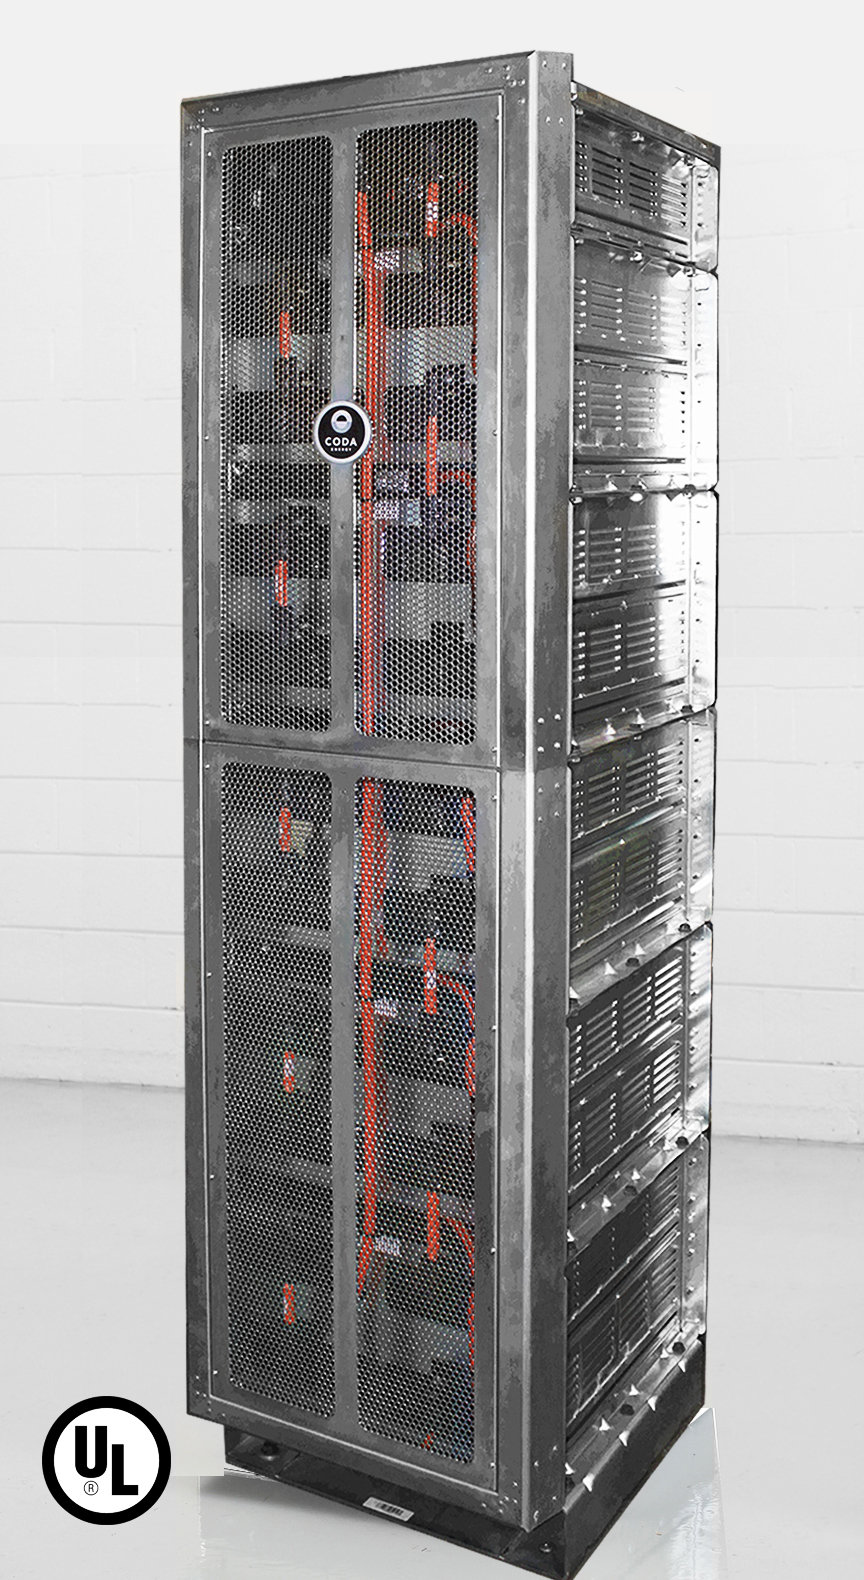 CODA Energy UL Listed CODA Core 50kWh Tower 2